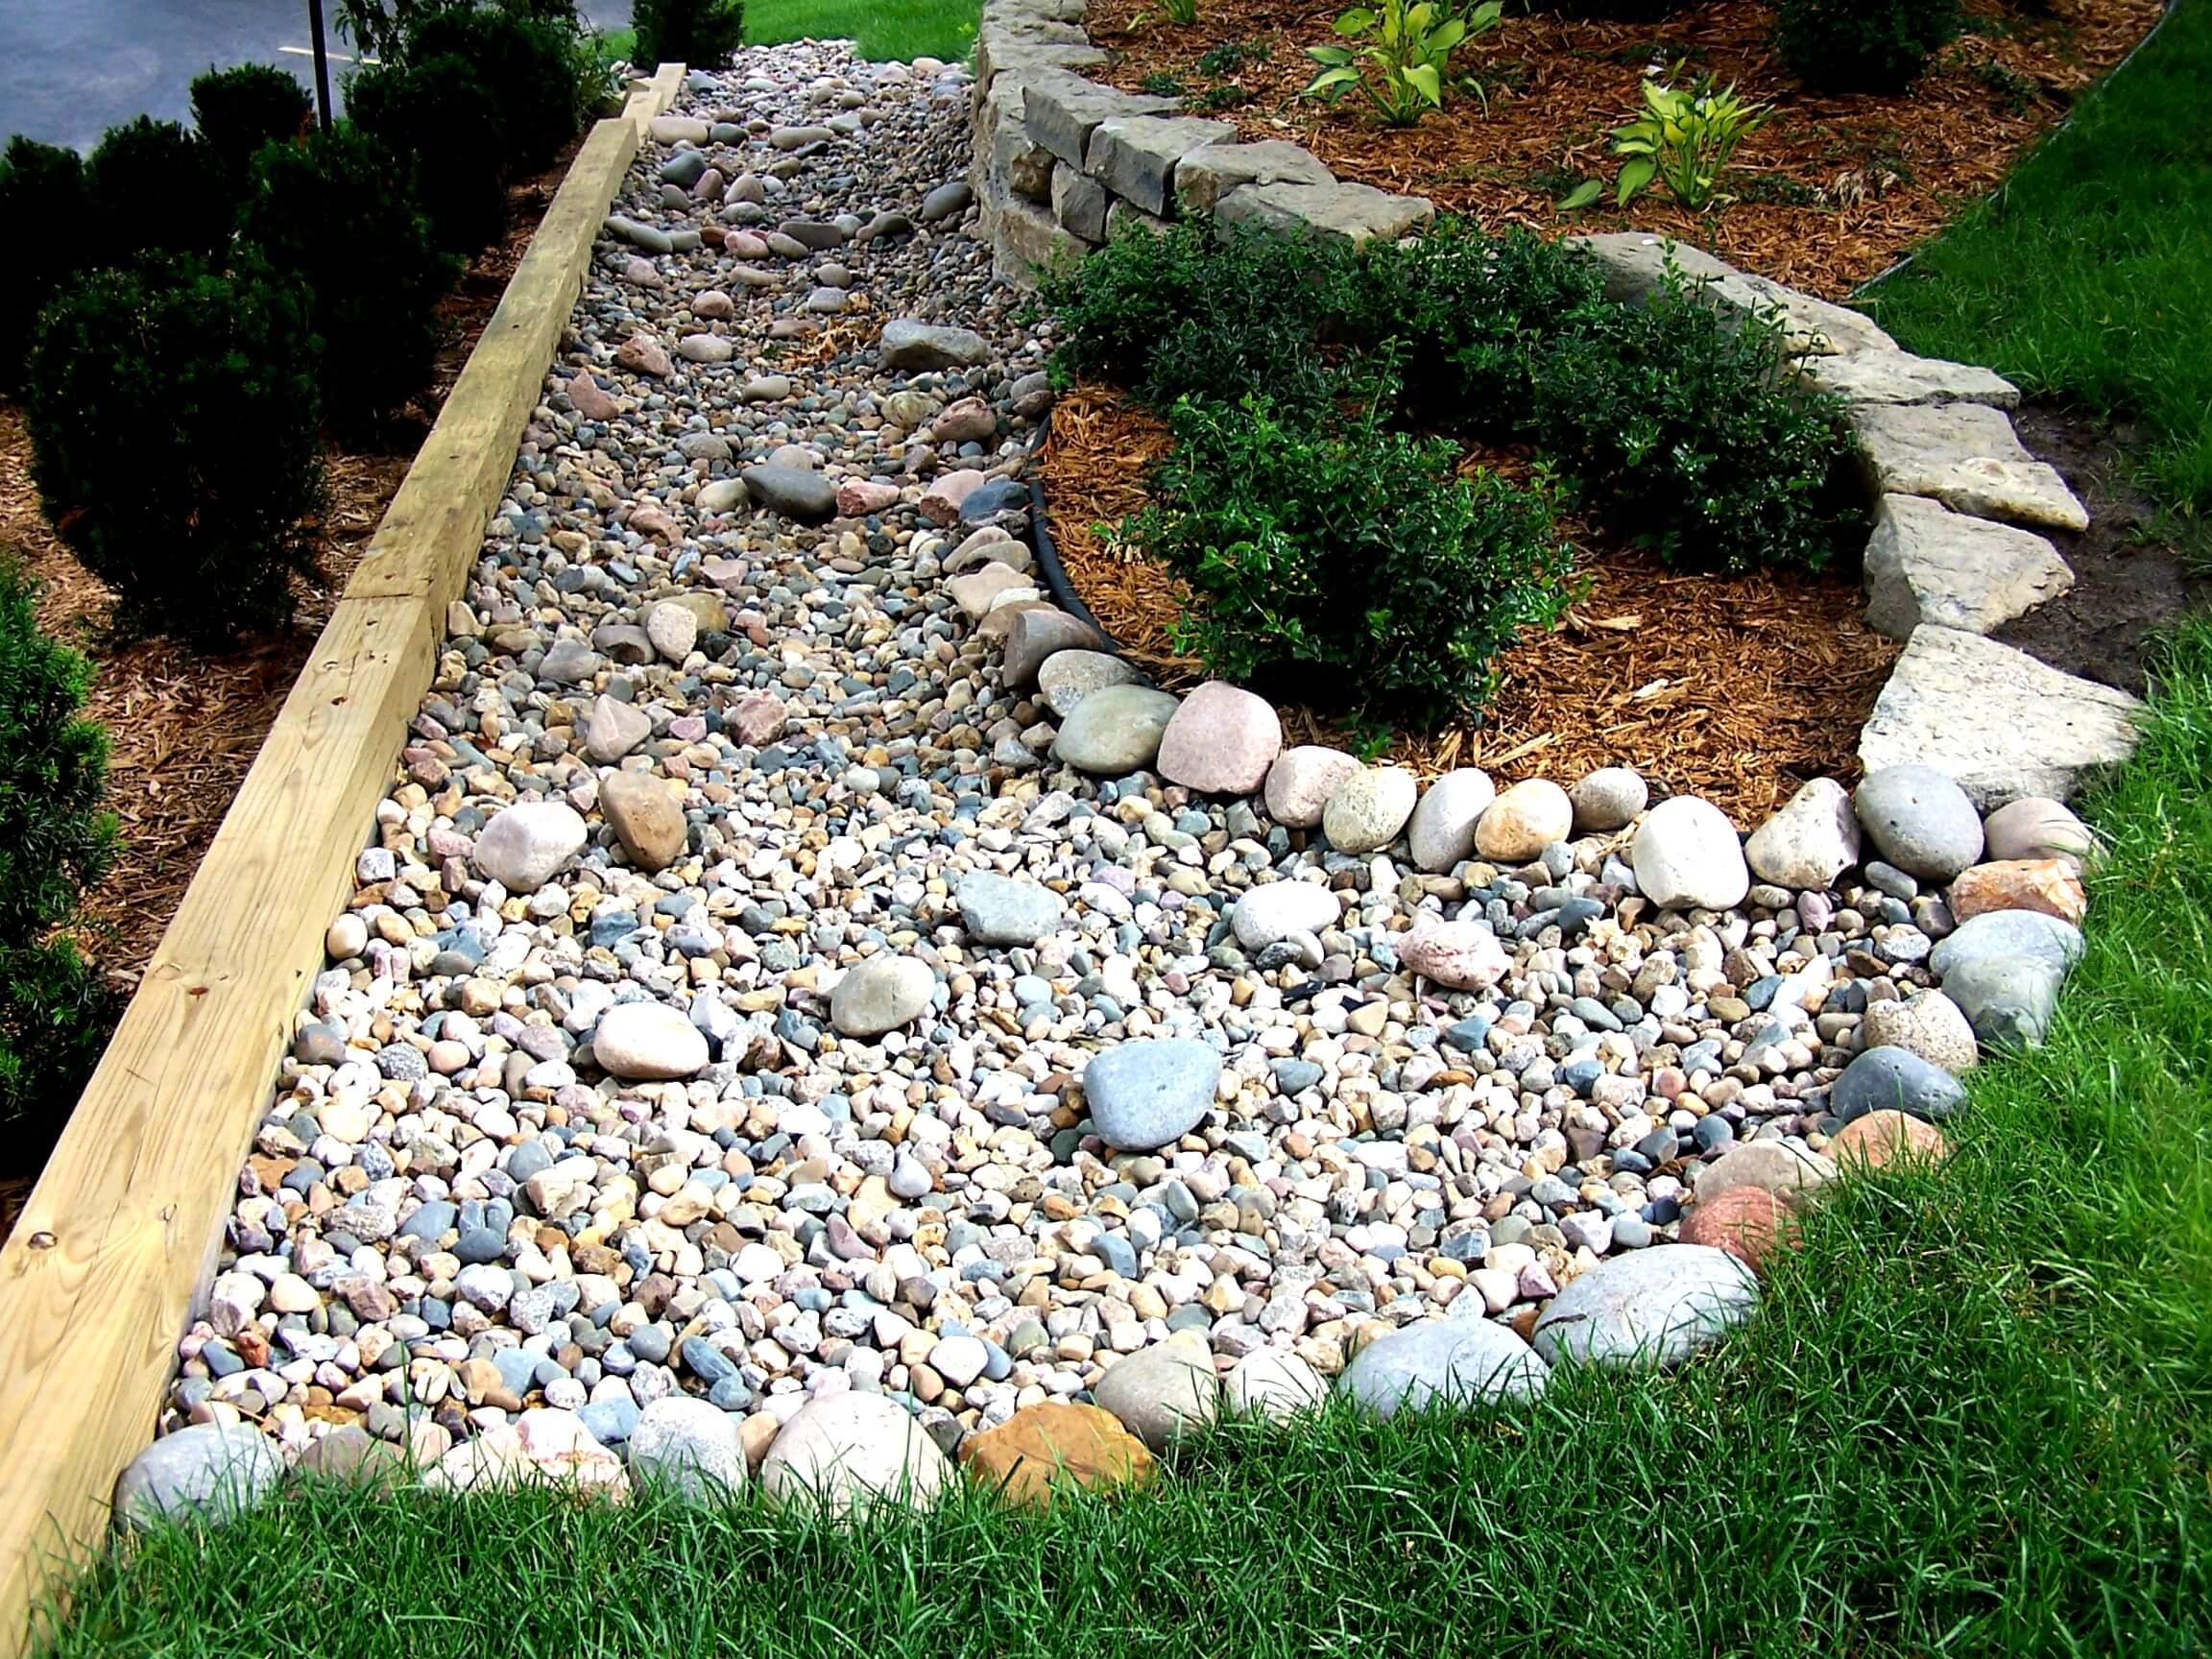 Rocks provide a lot of opportunities